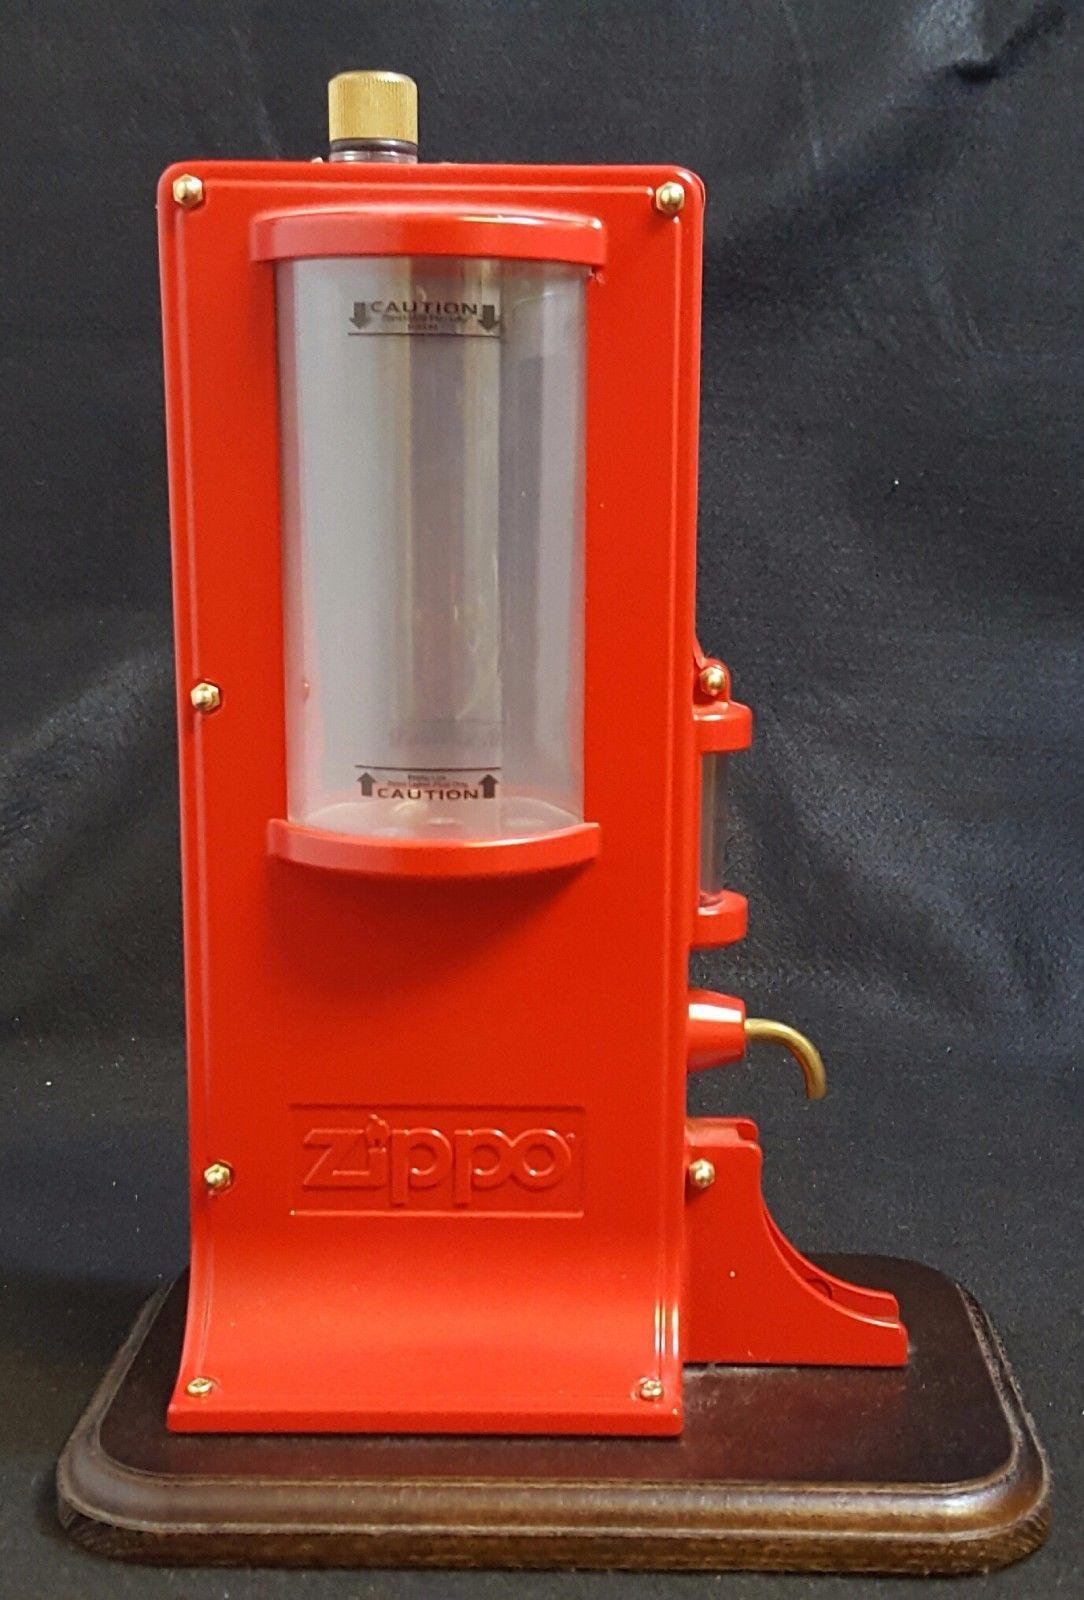 Rare Zippo Lighter Fluid Fuel Pump Filling Station Filler Zippo Lighter Fluid Zippo Lighter Lighter Fluid